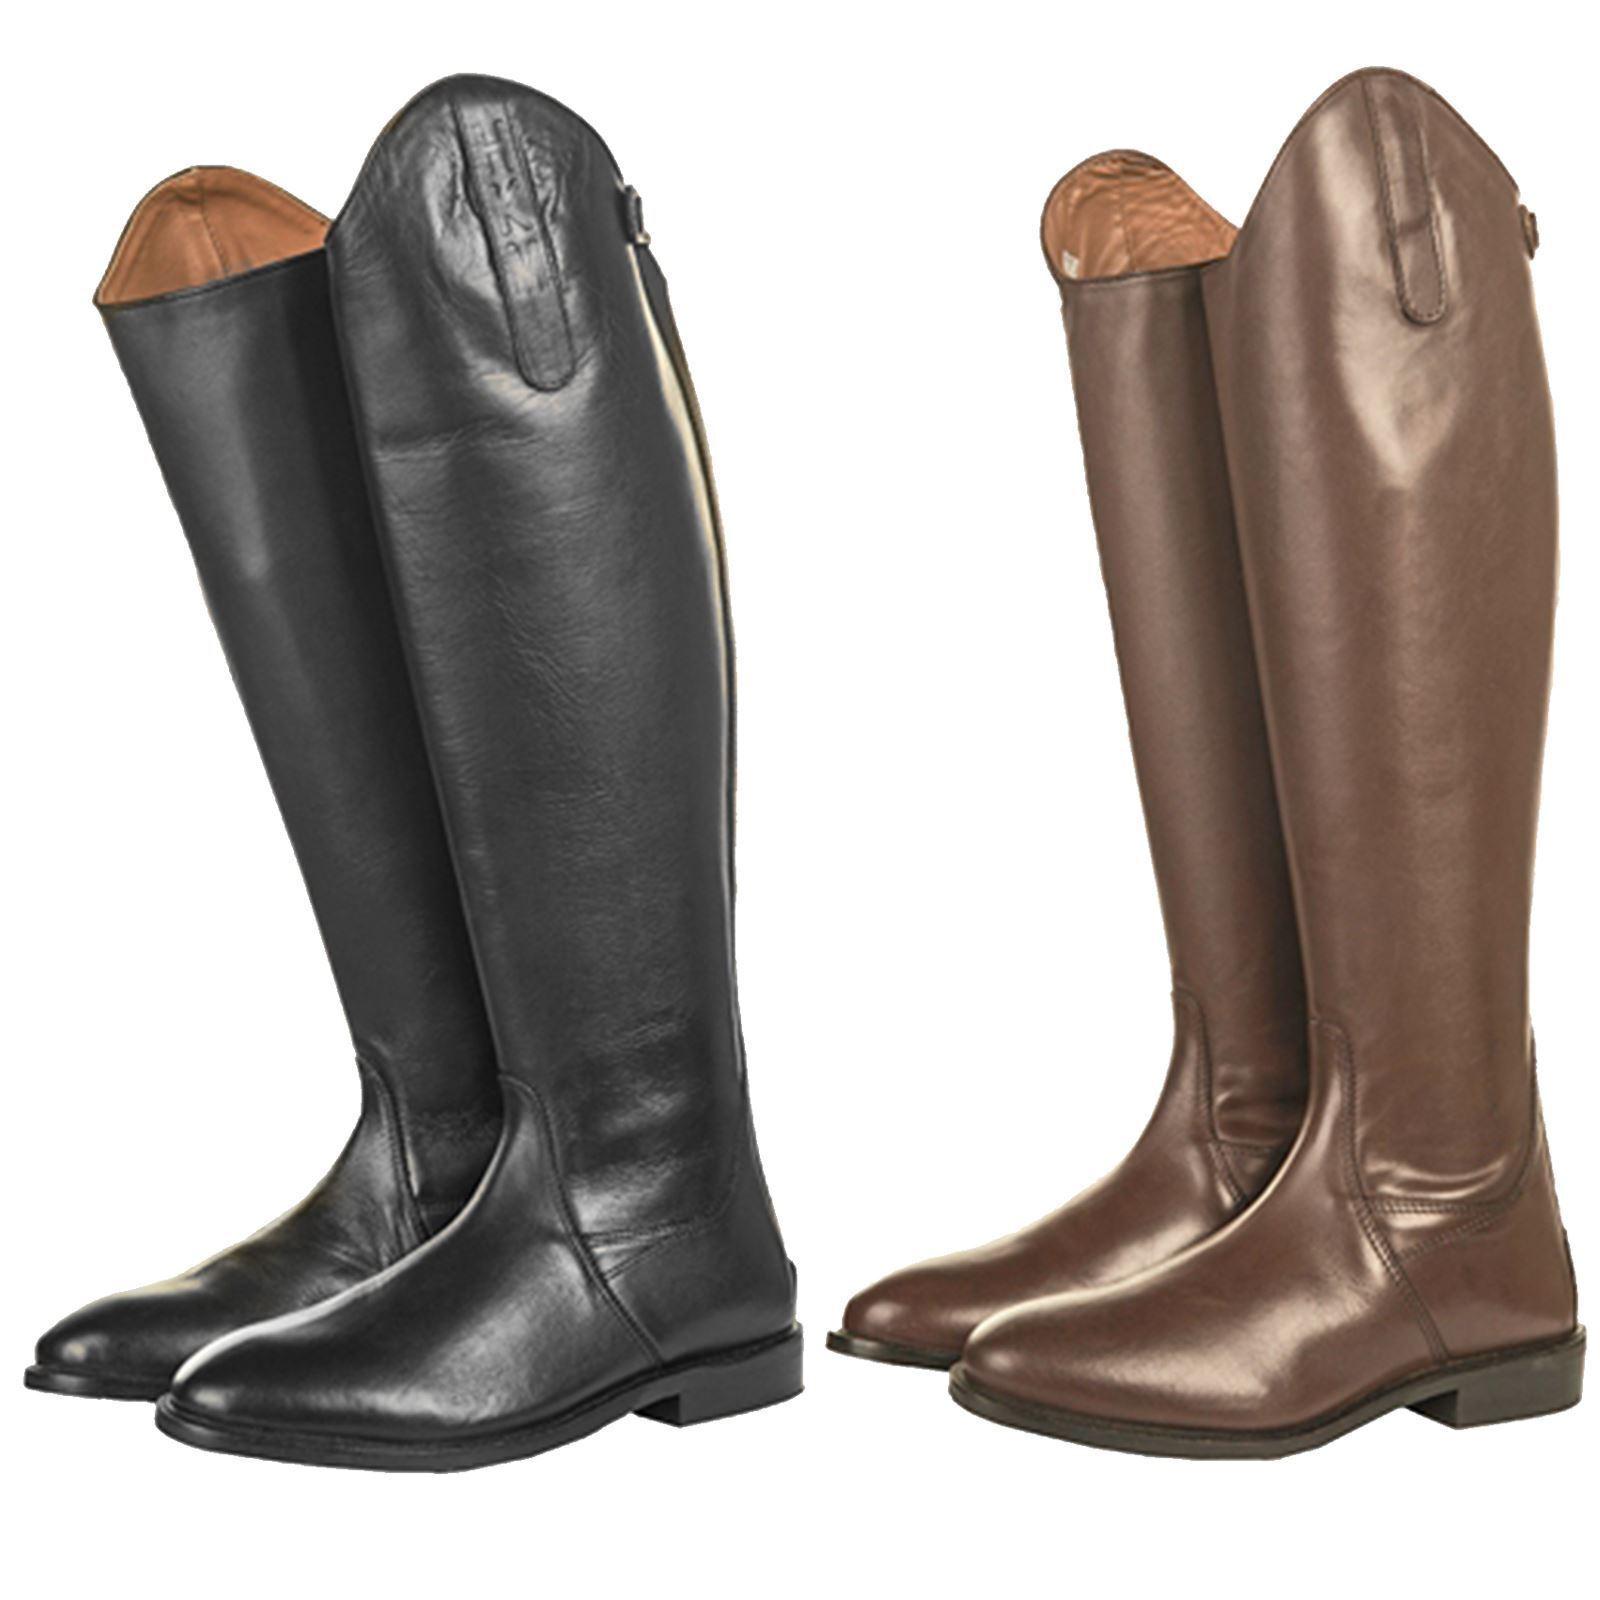 HKM Soft Adults  Soft HKM Leder Lined Short/Standard Width Horse Riding Long Stiefel 0eb63c